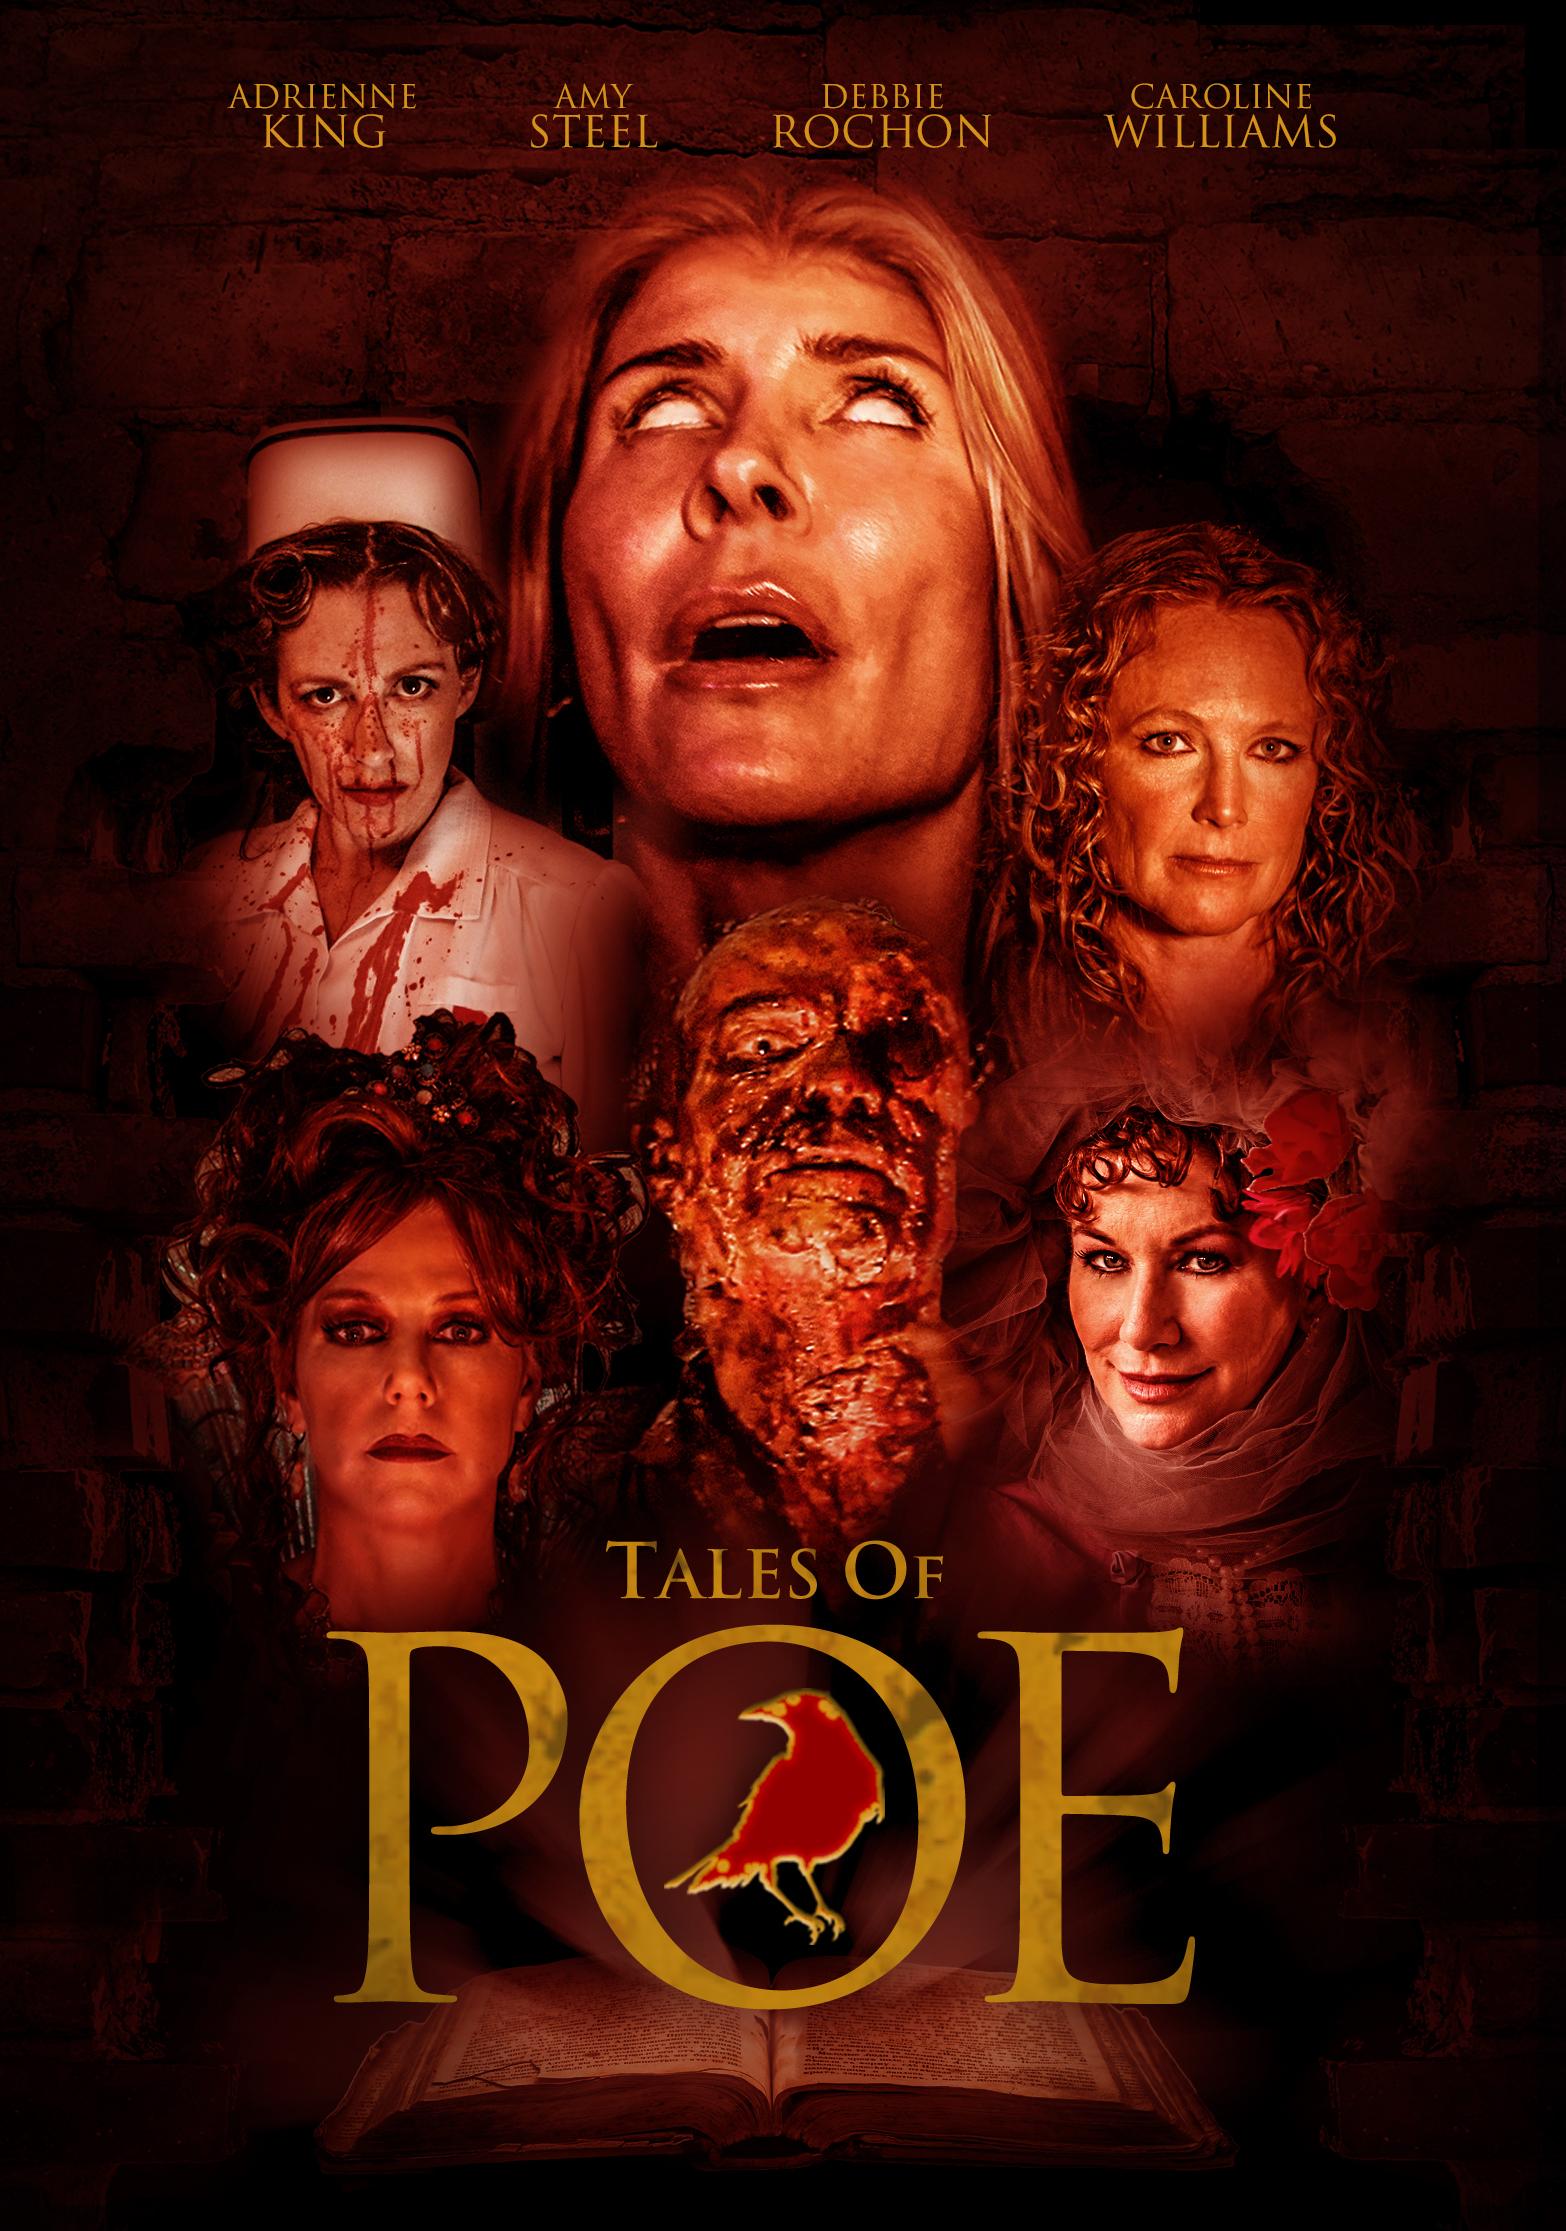 tales of poe 2014 imdb